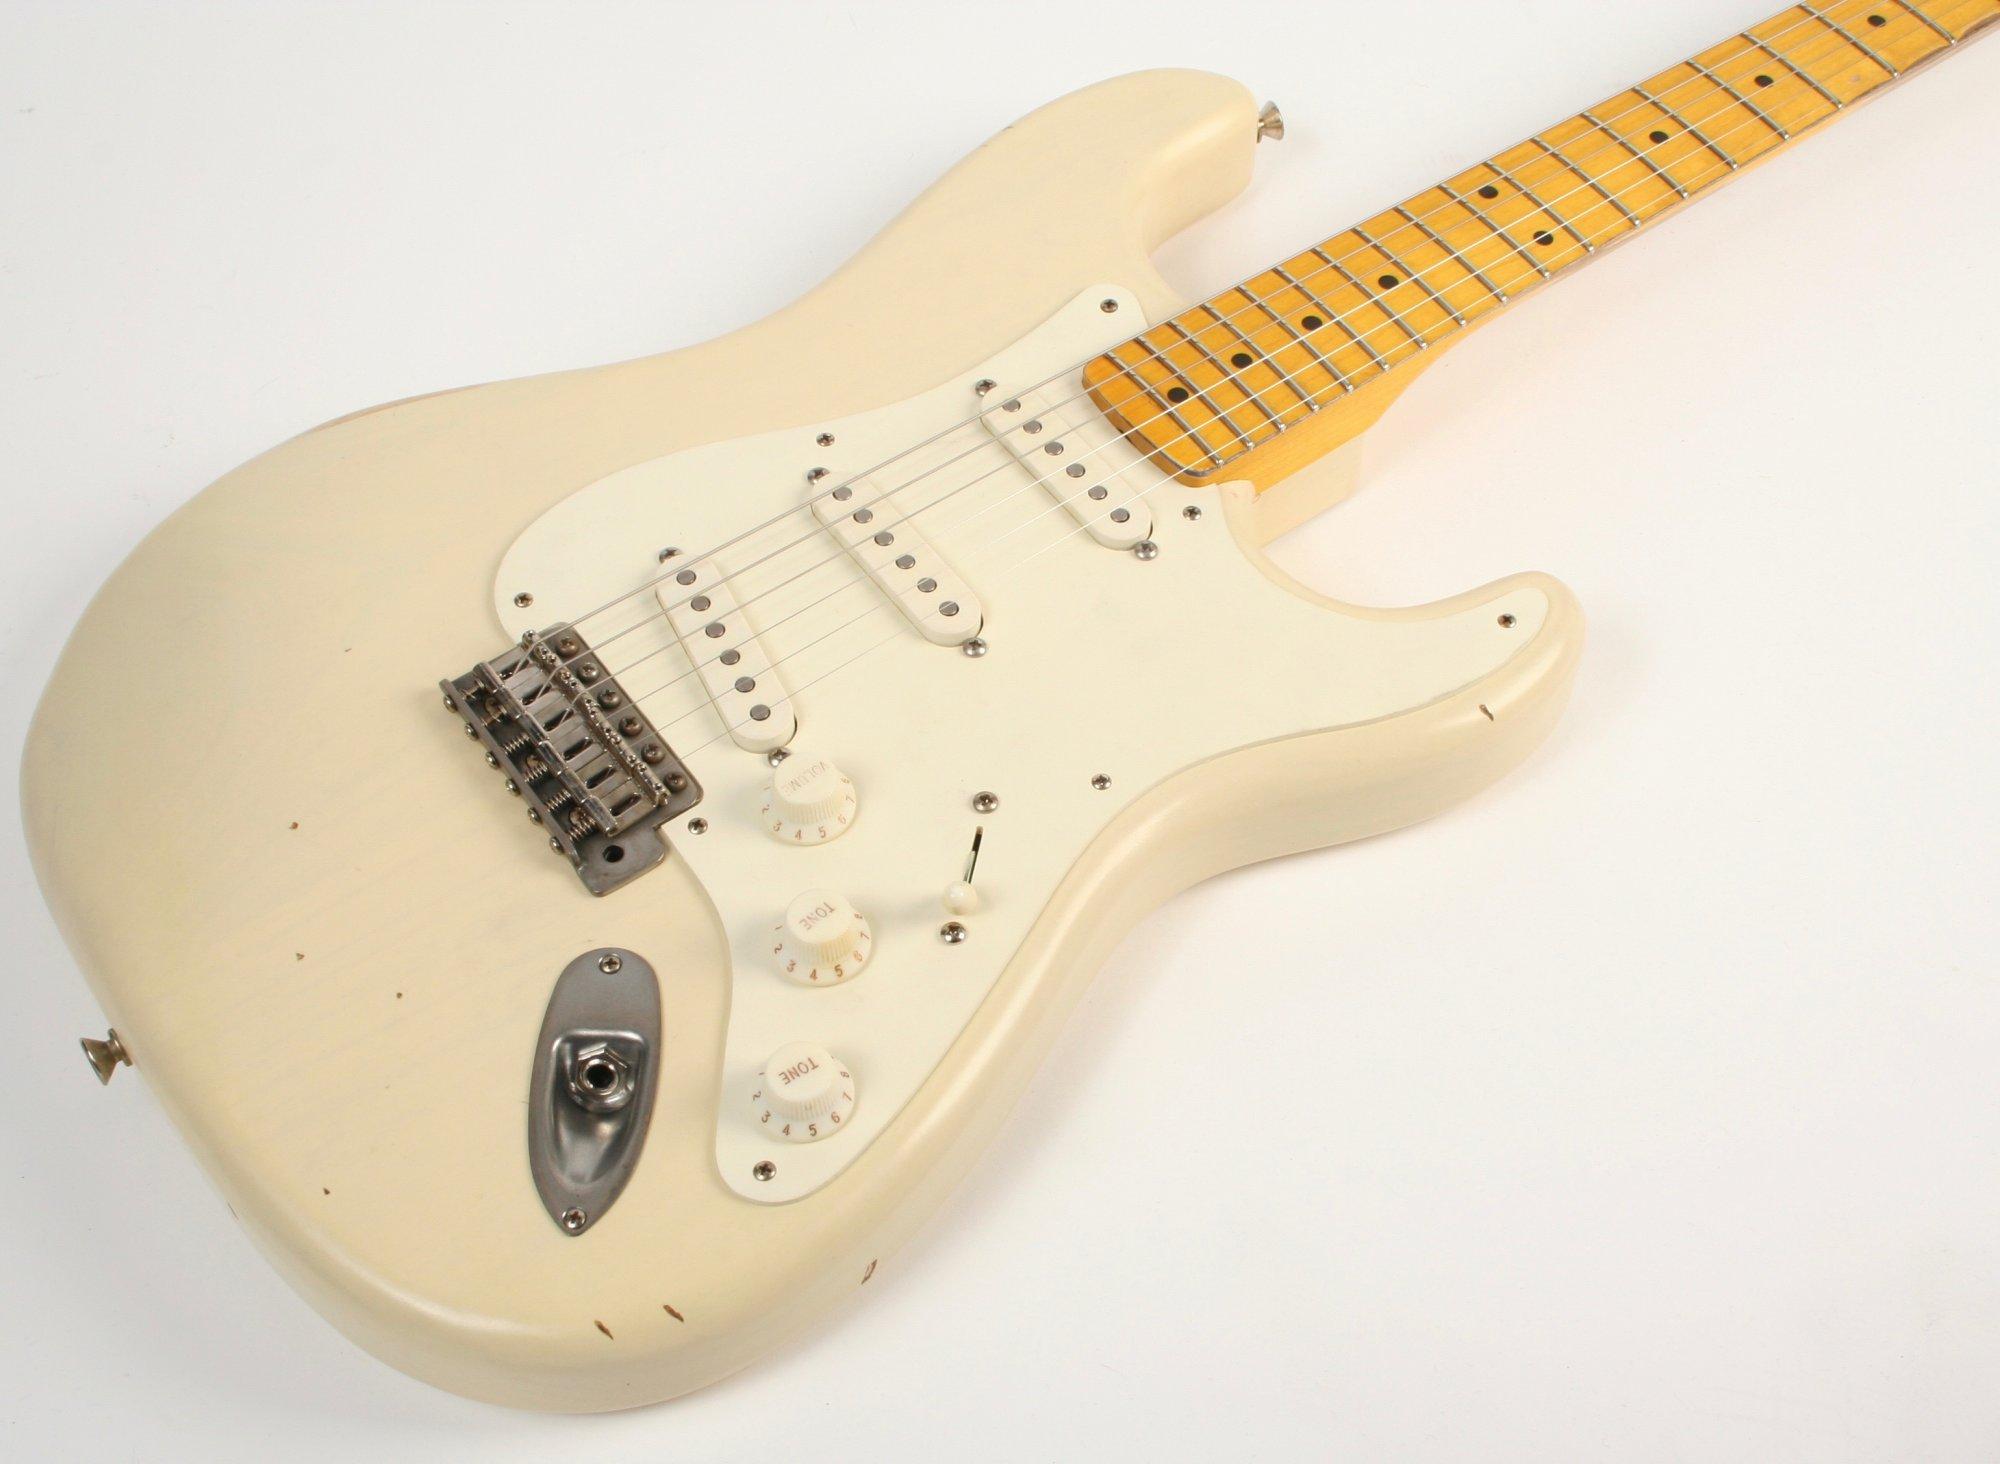 Nash Guitars S-57 Mary Kaye Lollar Pickups